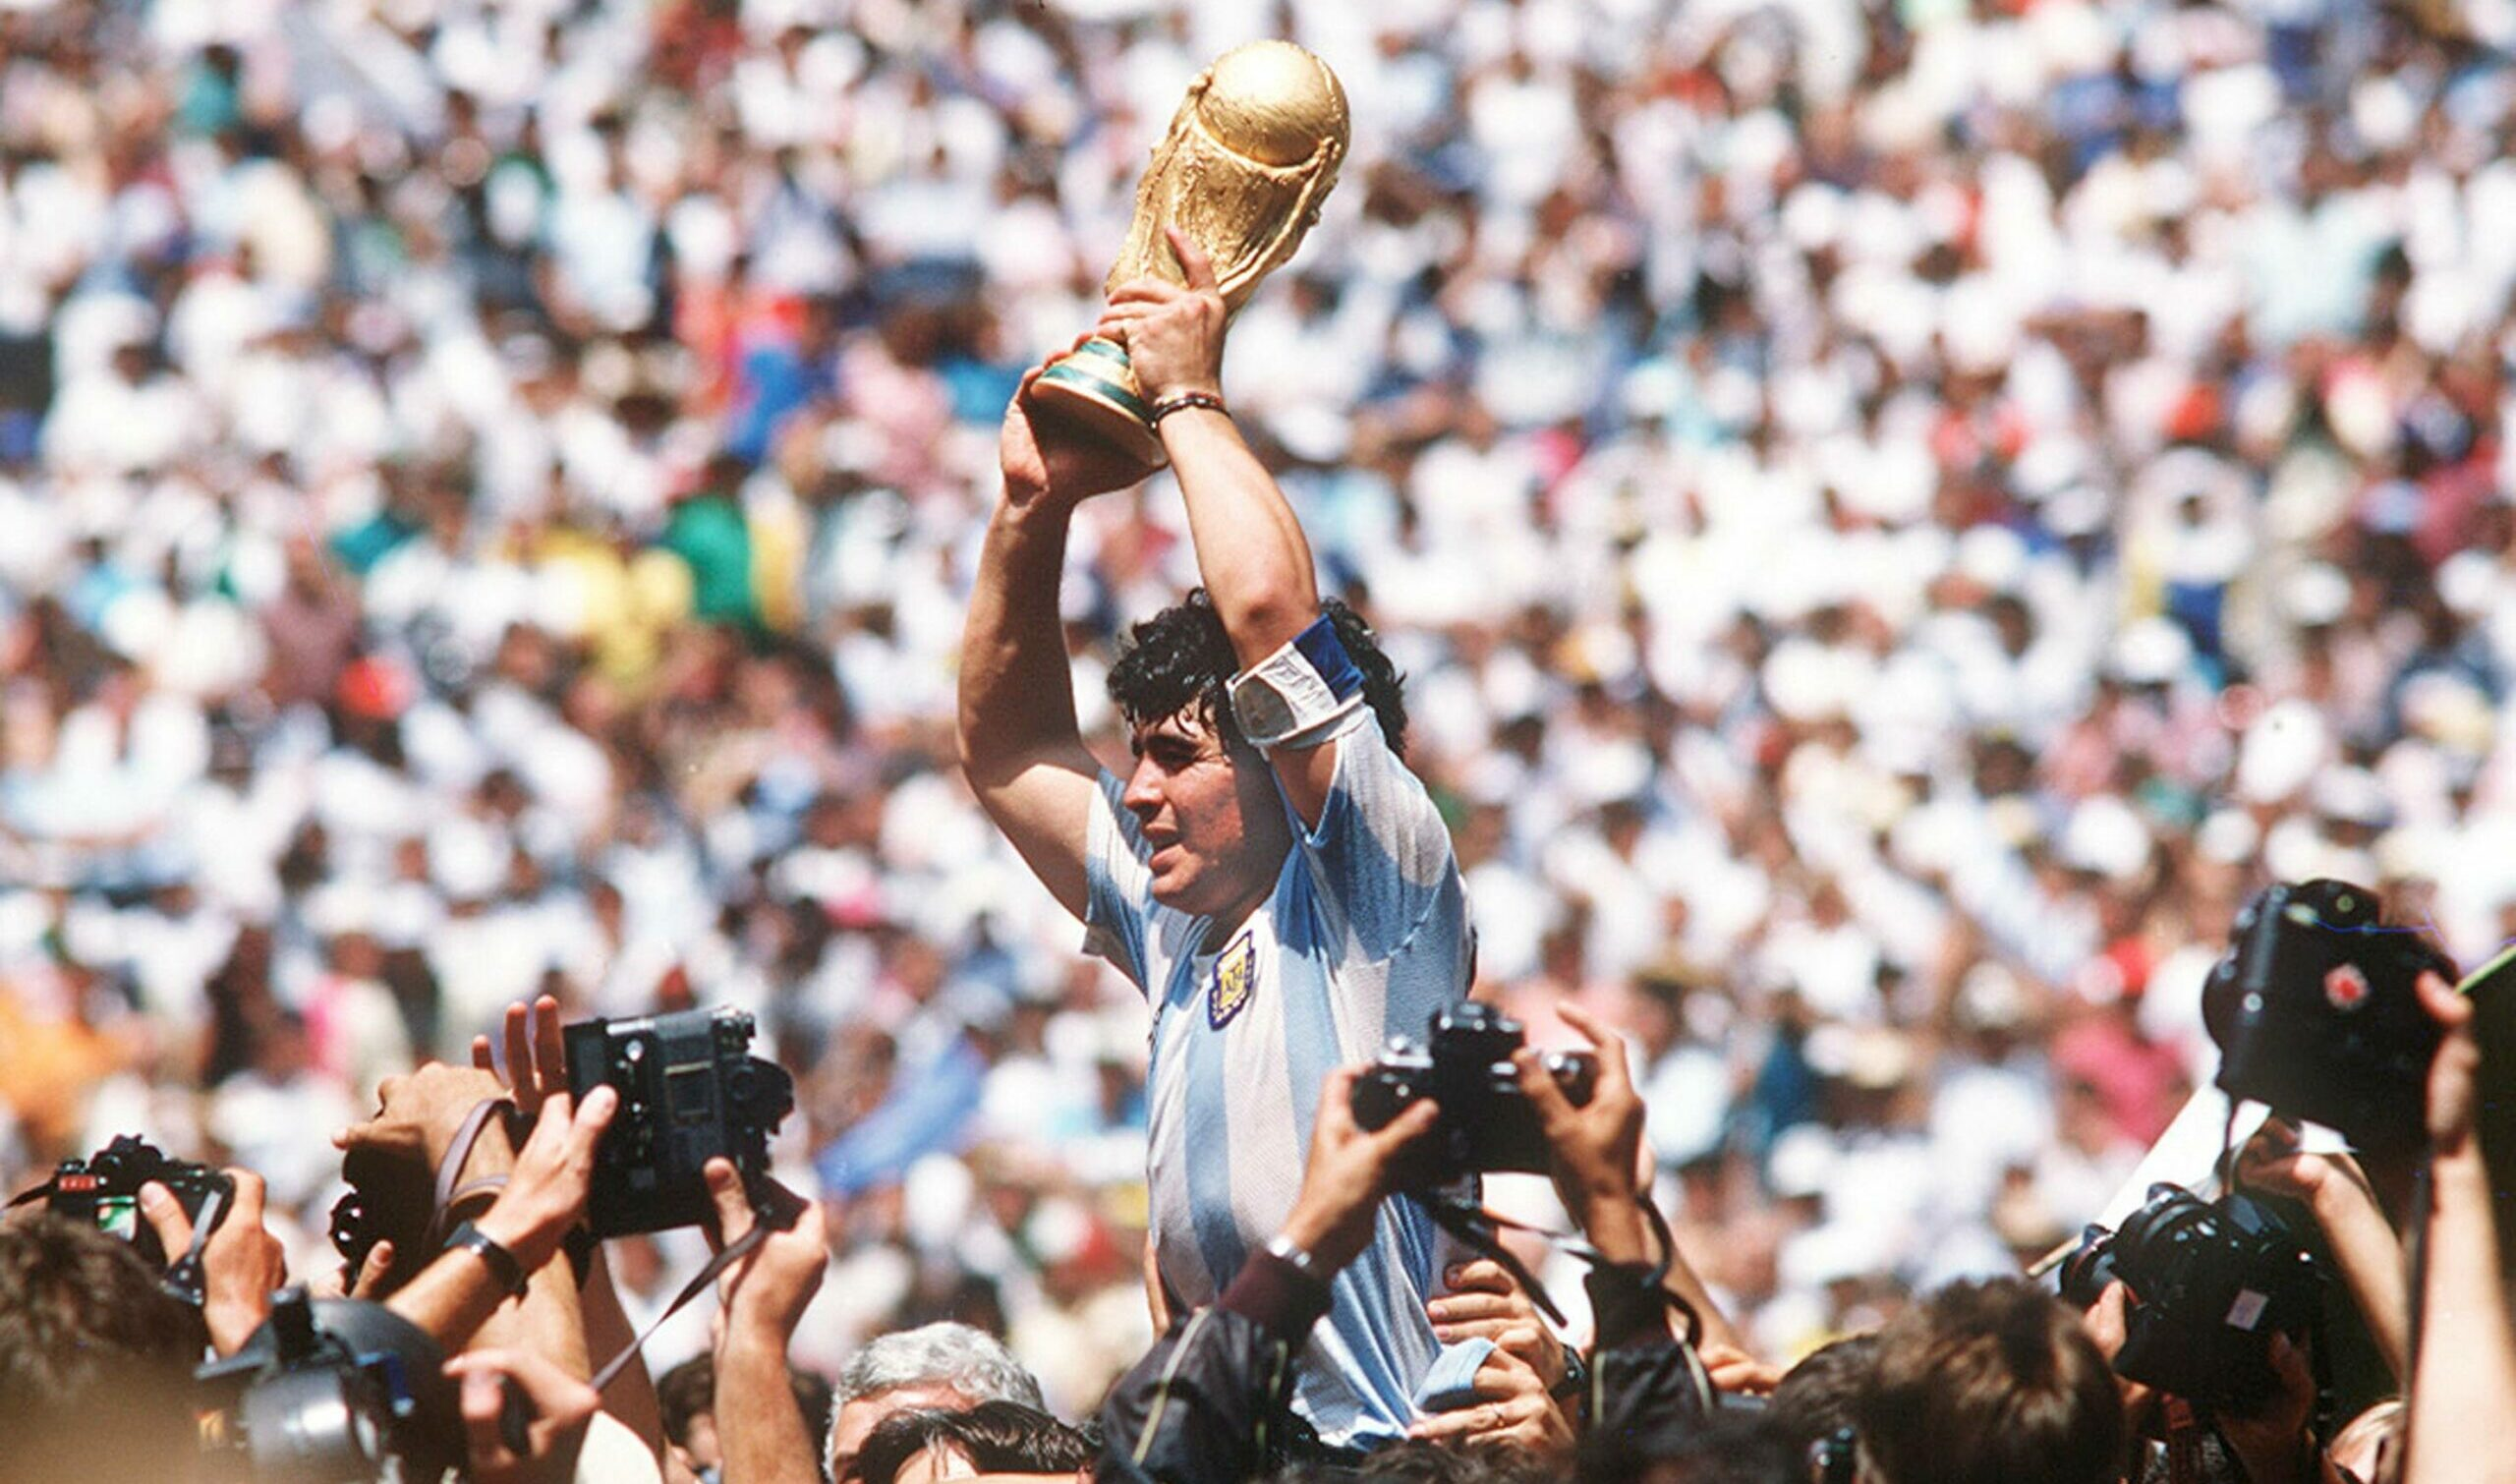 Maradona e a imortalidade - Foto: Imago/Pressefoto Baumann / One Football